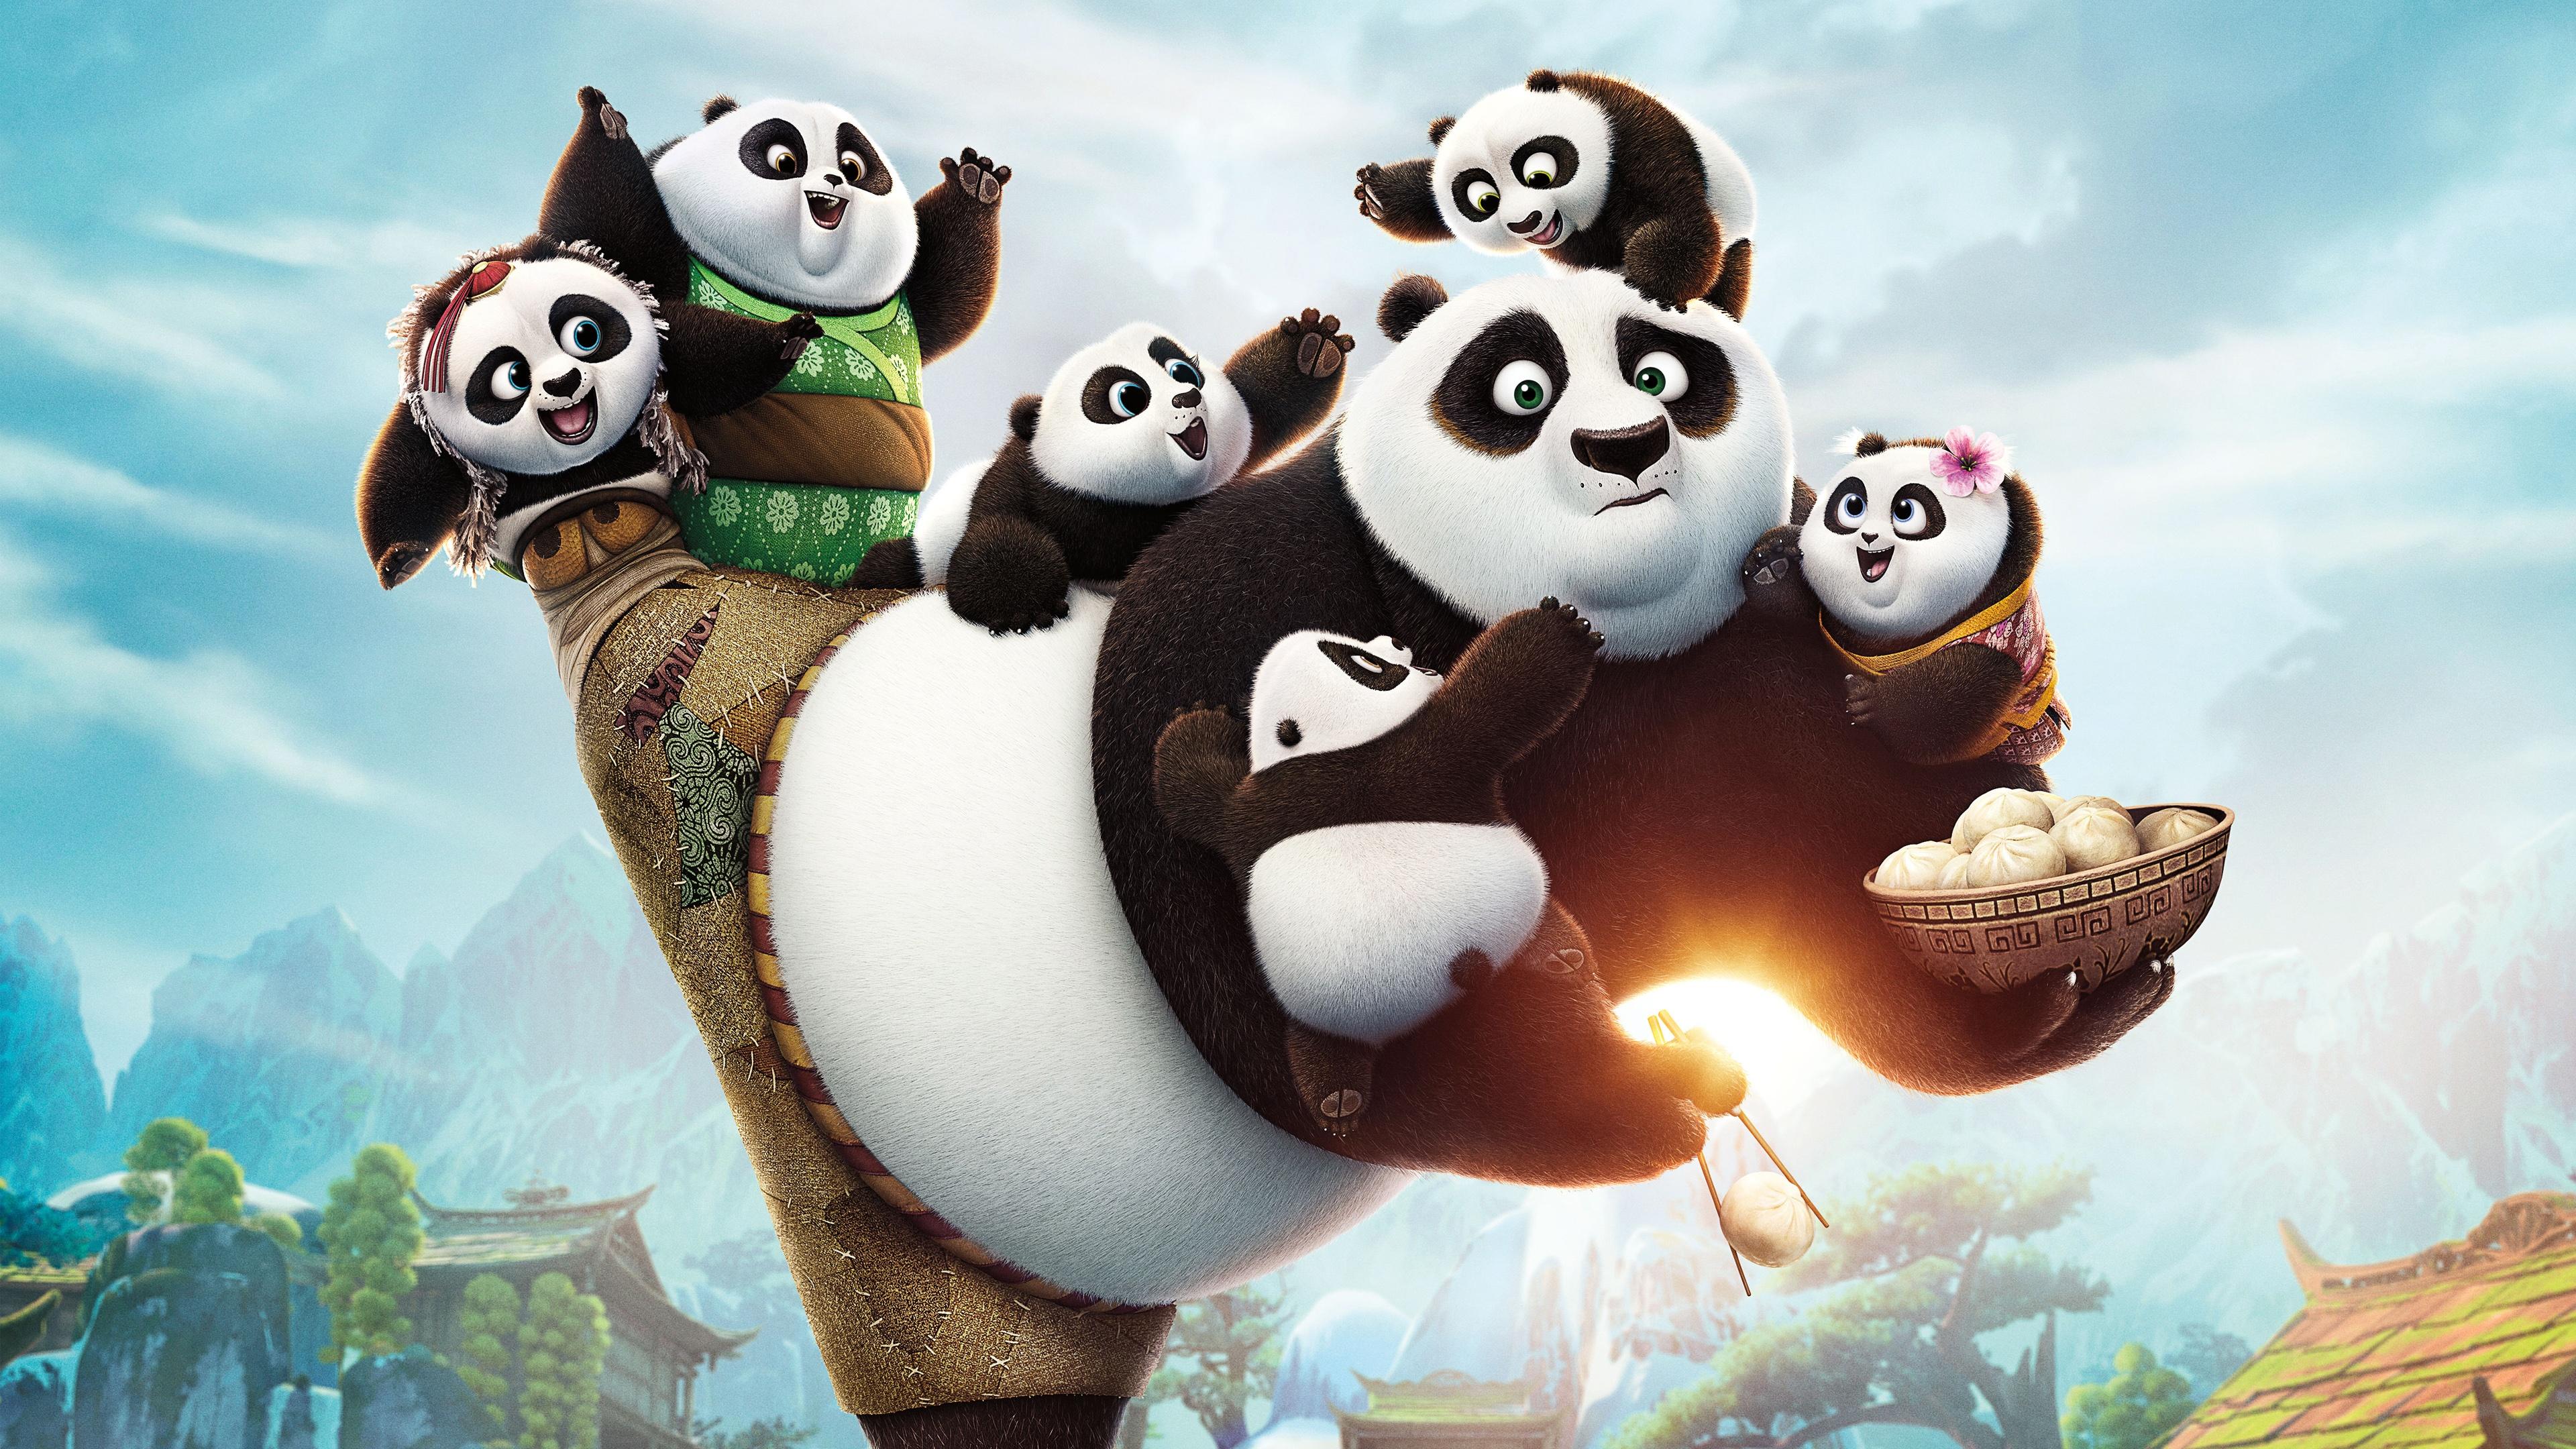 Kung Fu Panda 3 2016 Wallpapers In Jpg Format For Free Download